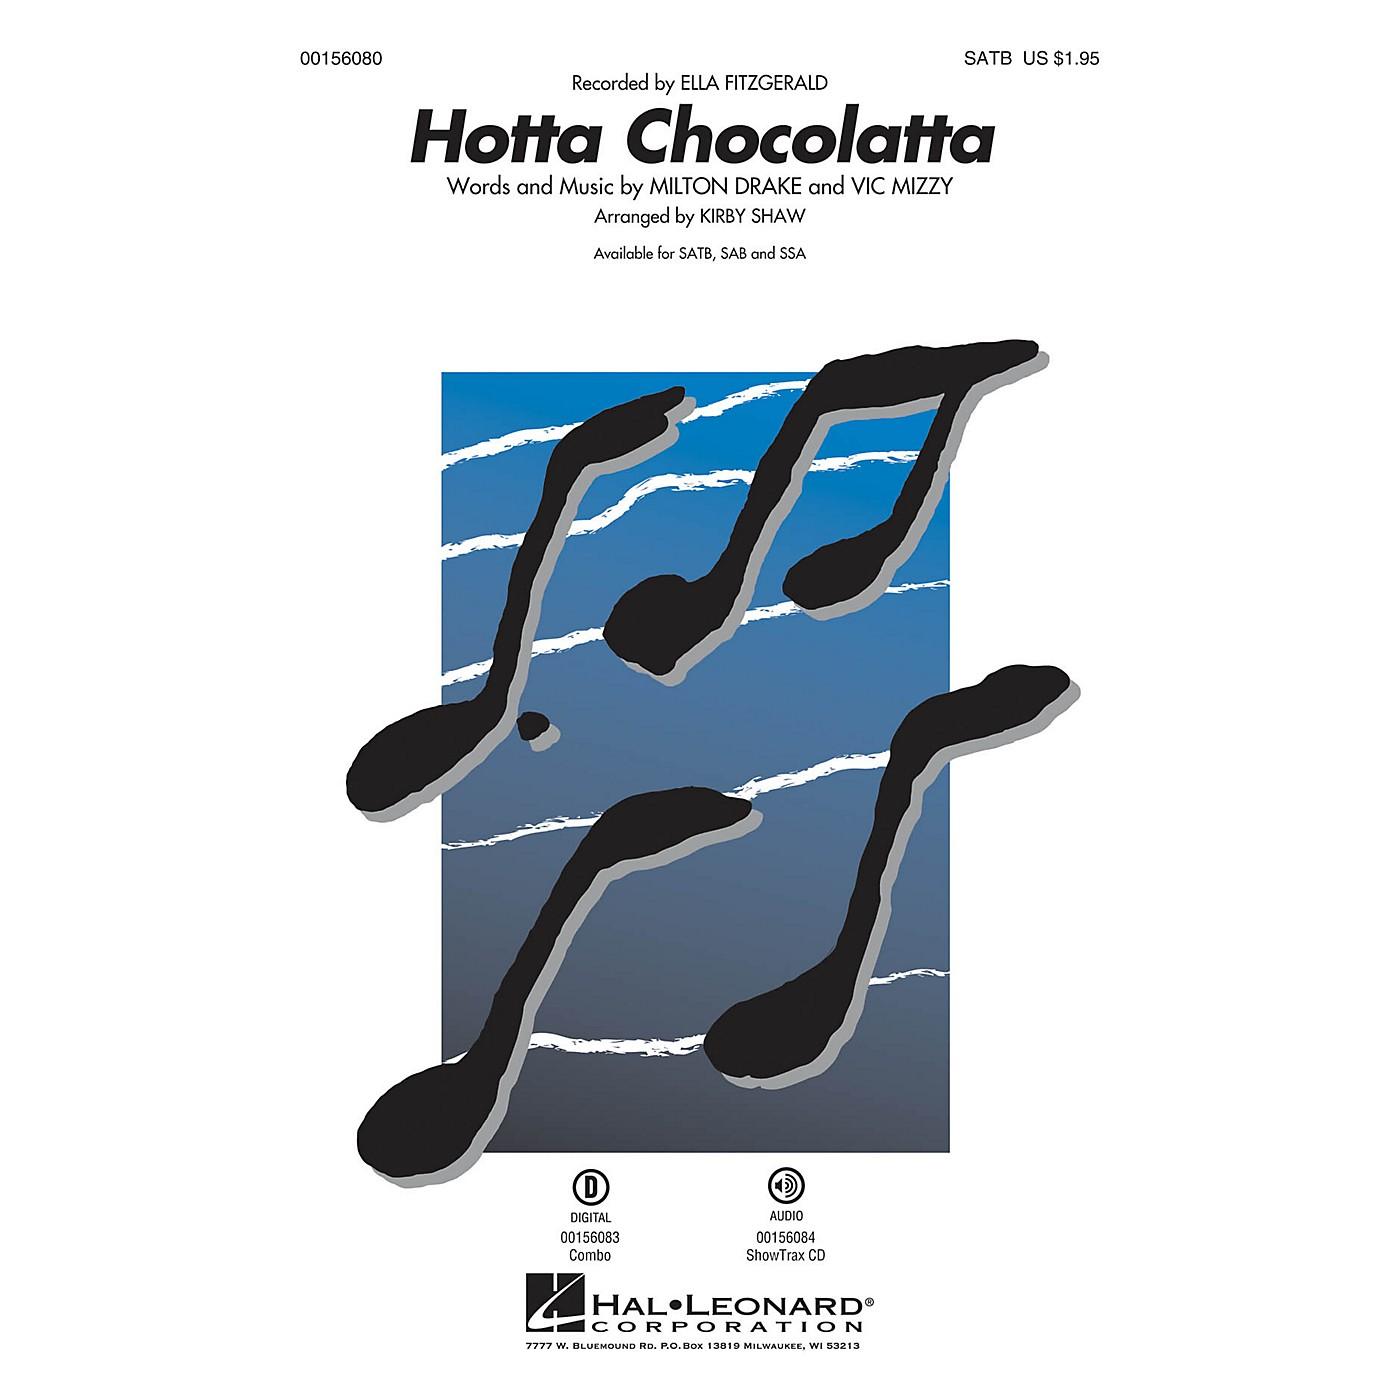 Hal Leonard Hotta Chocolatta SATB by Ella Fitzgerald arranged by Kirby Shaw thumbnail